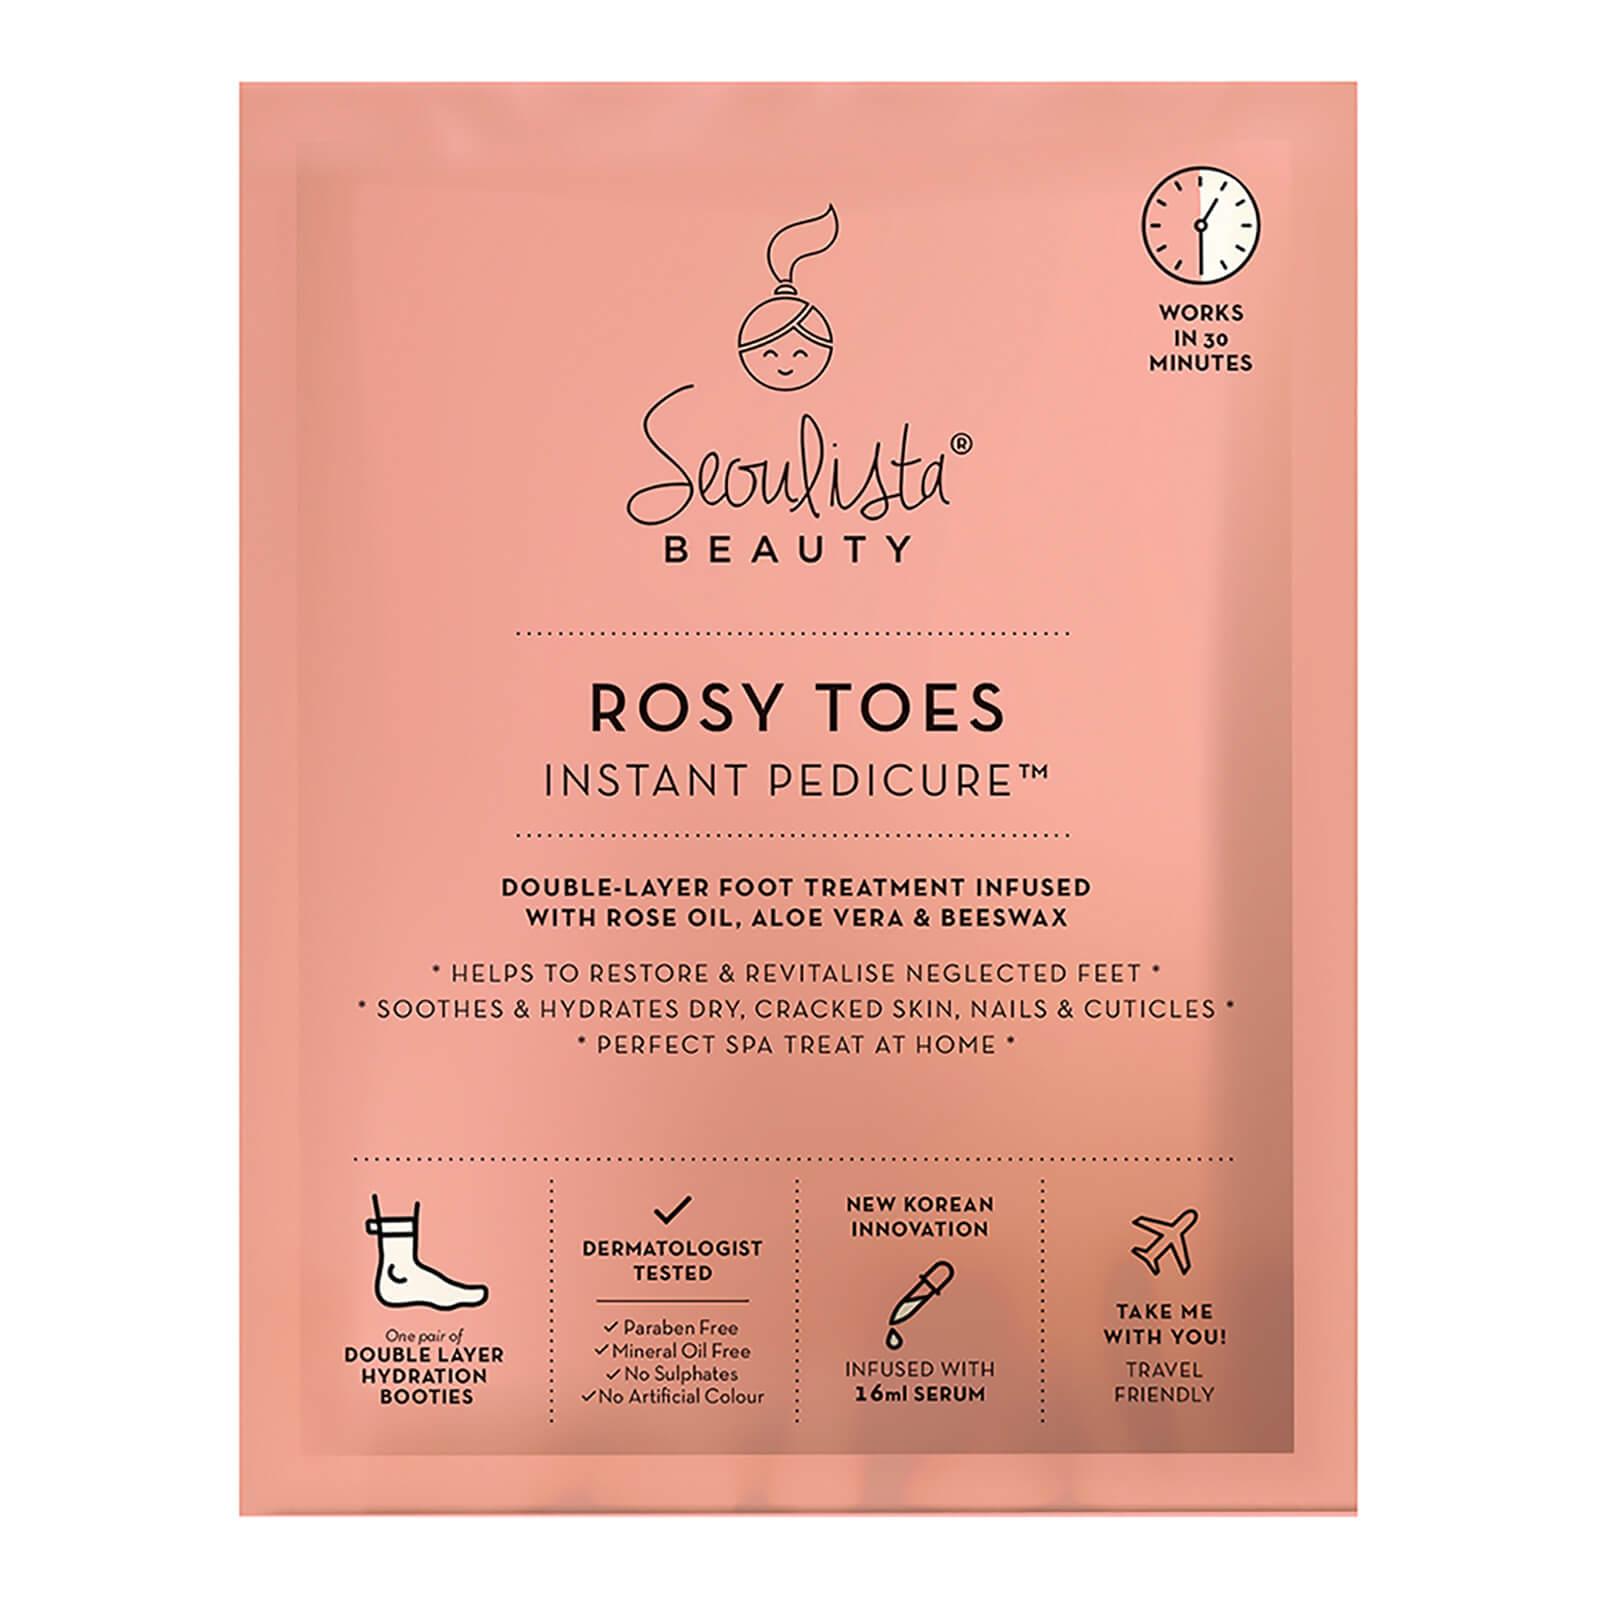 Mascarilla revitalizadora, suavizante e hidratante para pies de Seoulista Beauty